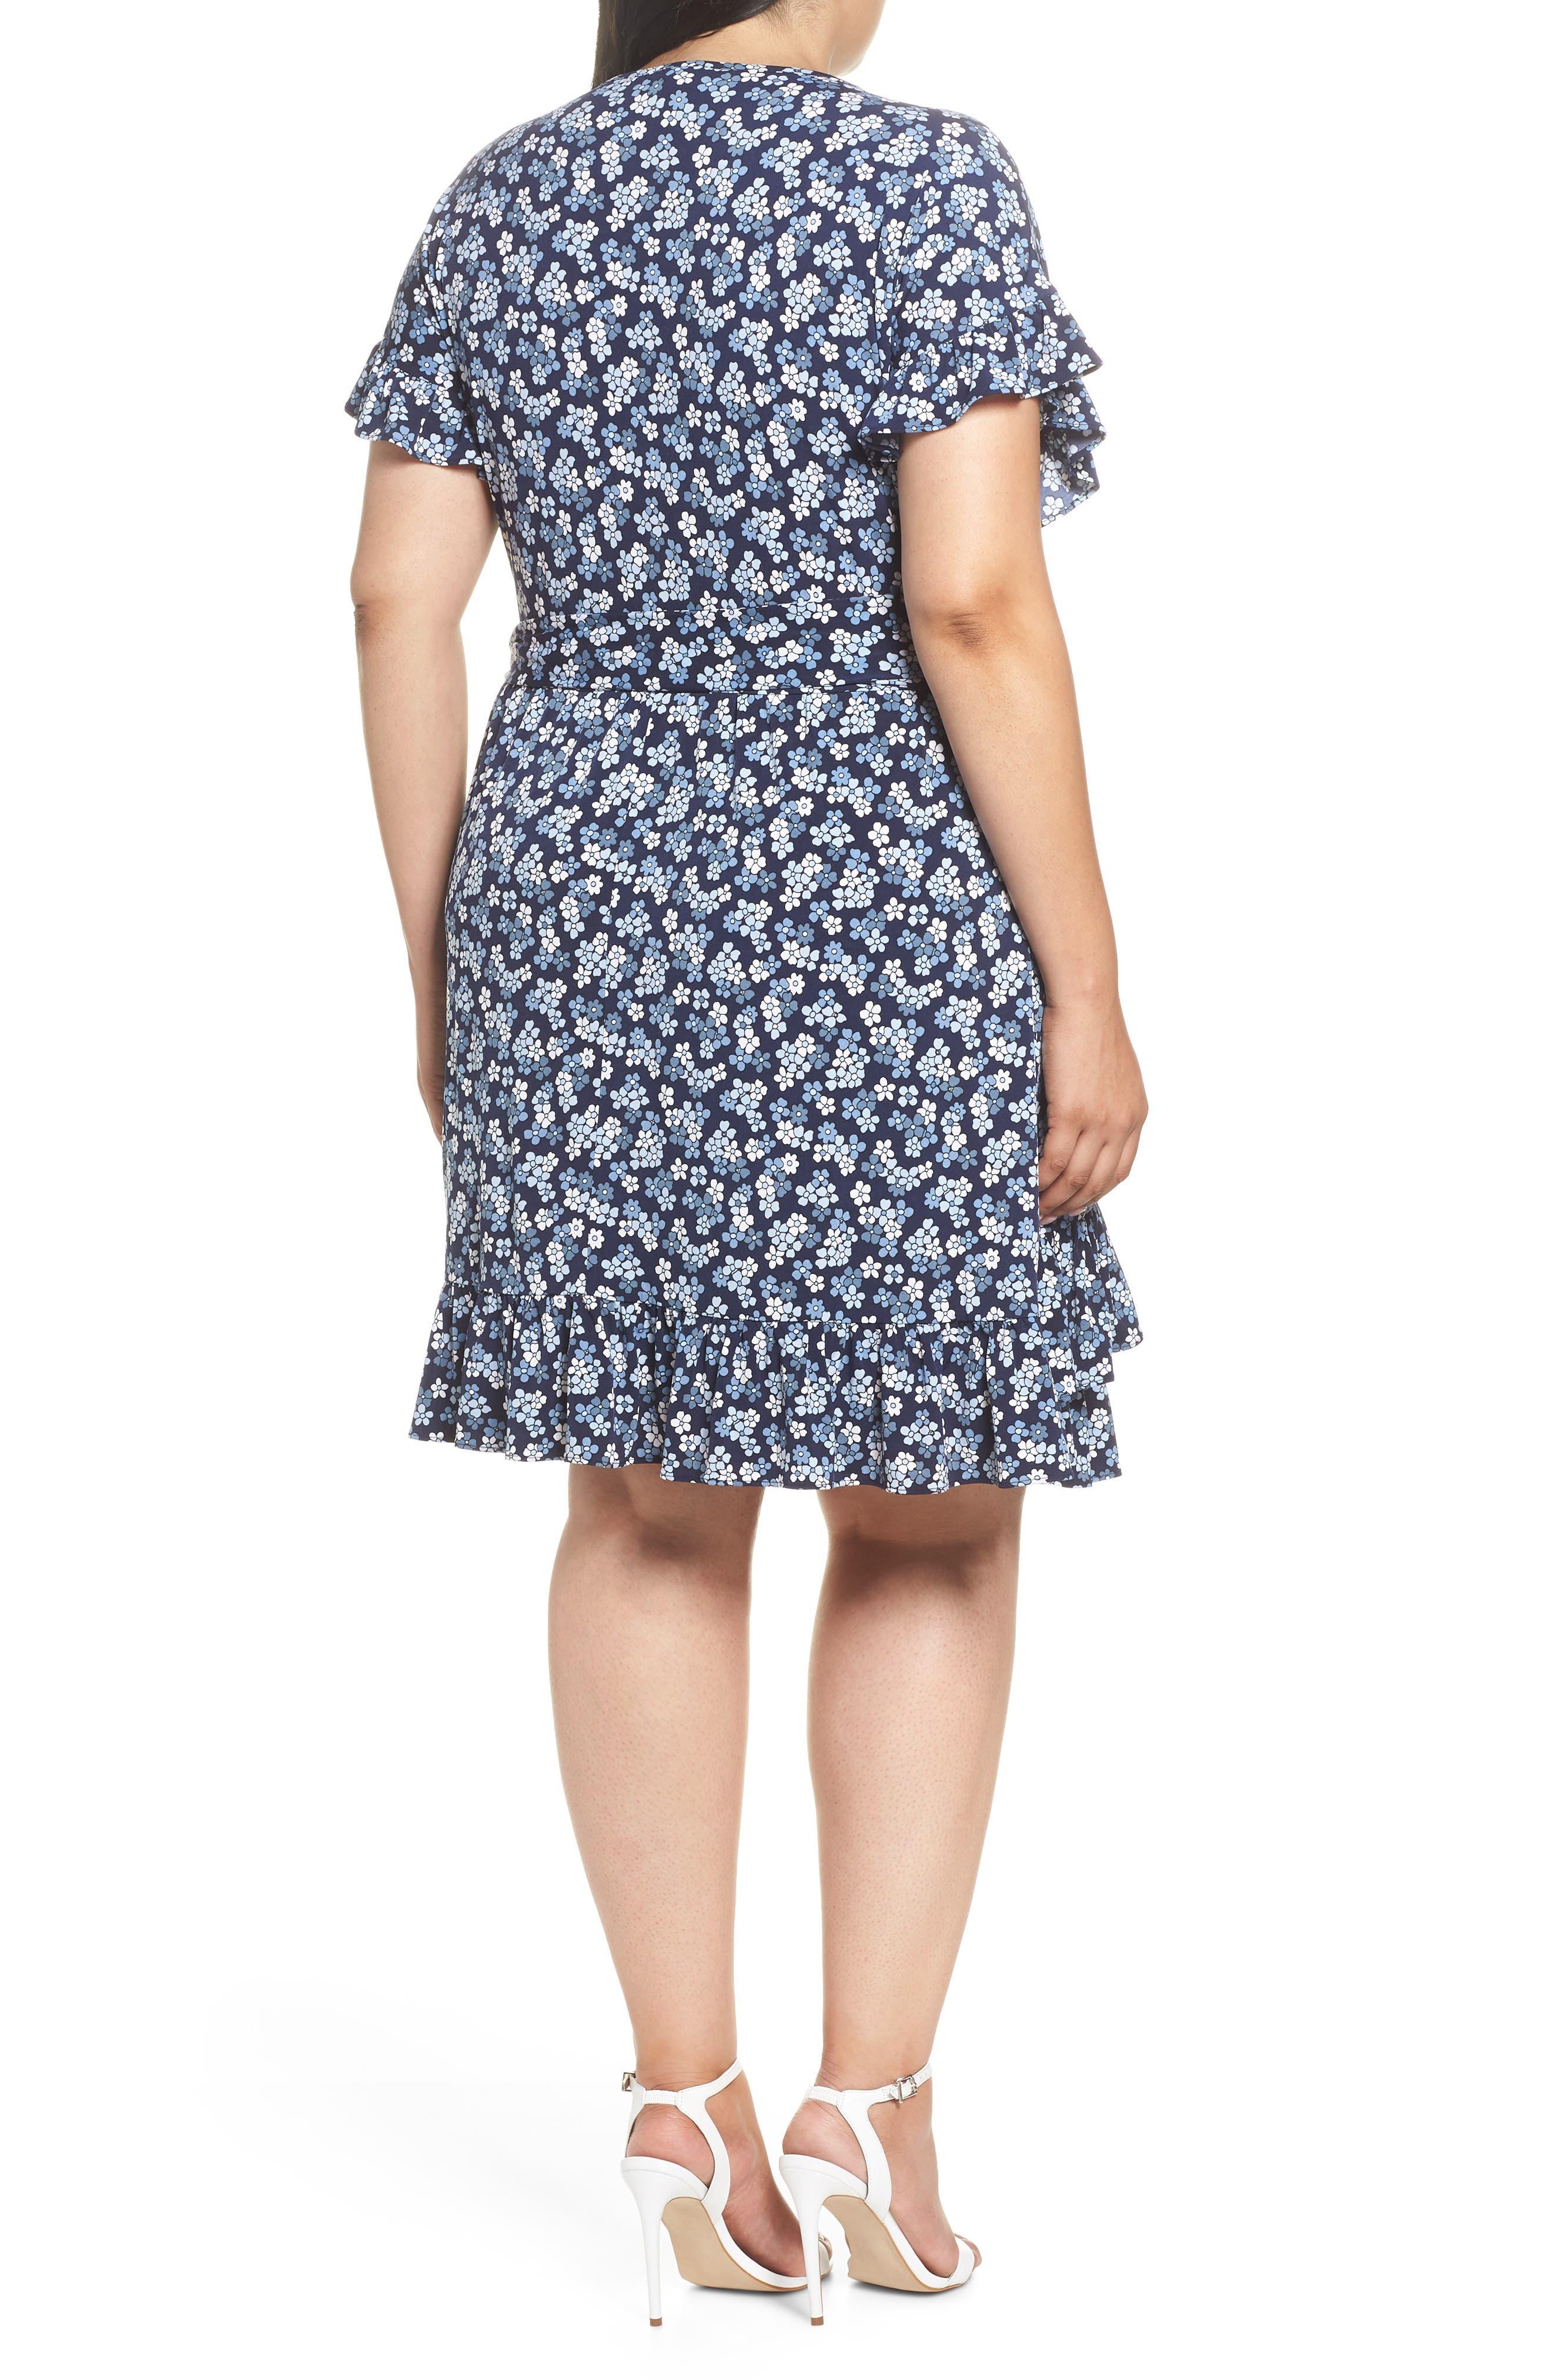 Cherry Blossom Ruffle Faux Wrap Dress,                             Alternate thumbnail 2, color,                             True Navy/ Light Chambray